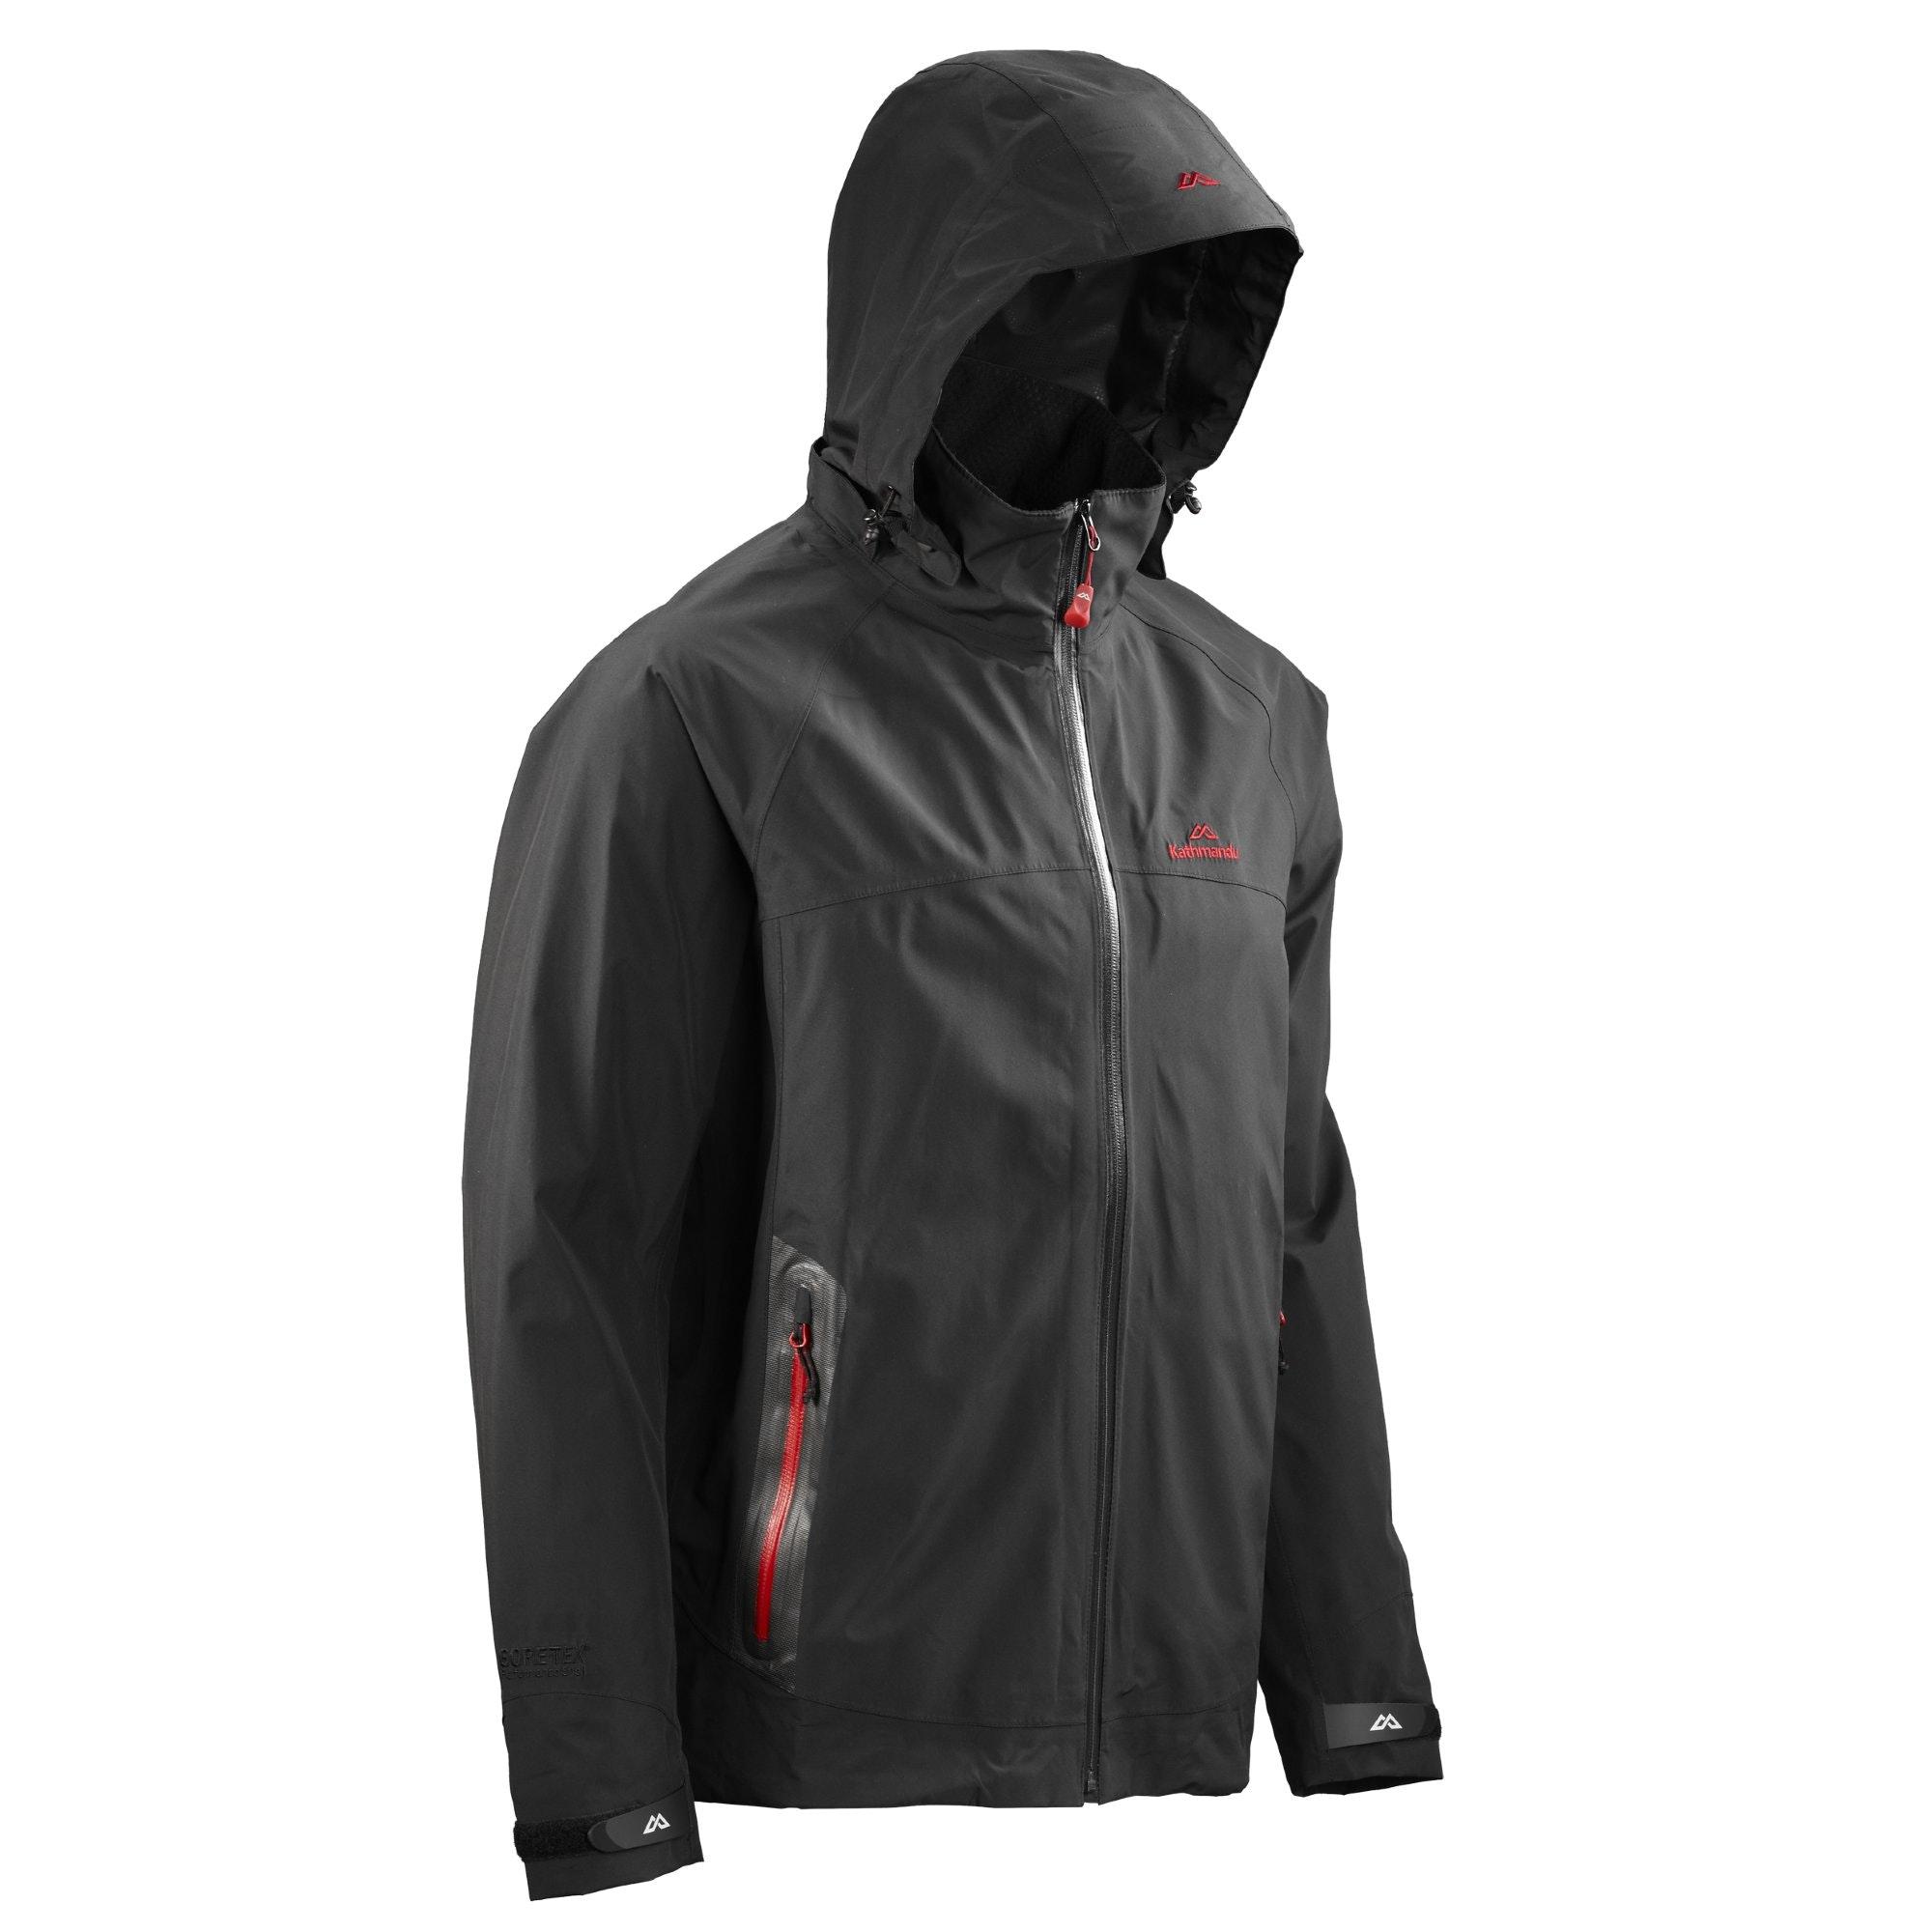 kathmandu blackburn mens gore tex waterproof windproof hooded jacket new ebay. Black Bedroom Furniture Sets. Home Design Ideas